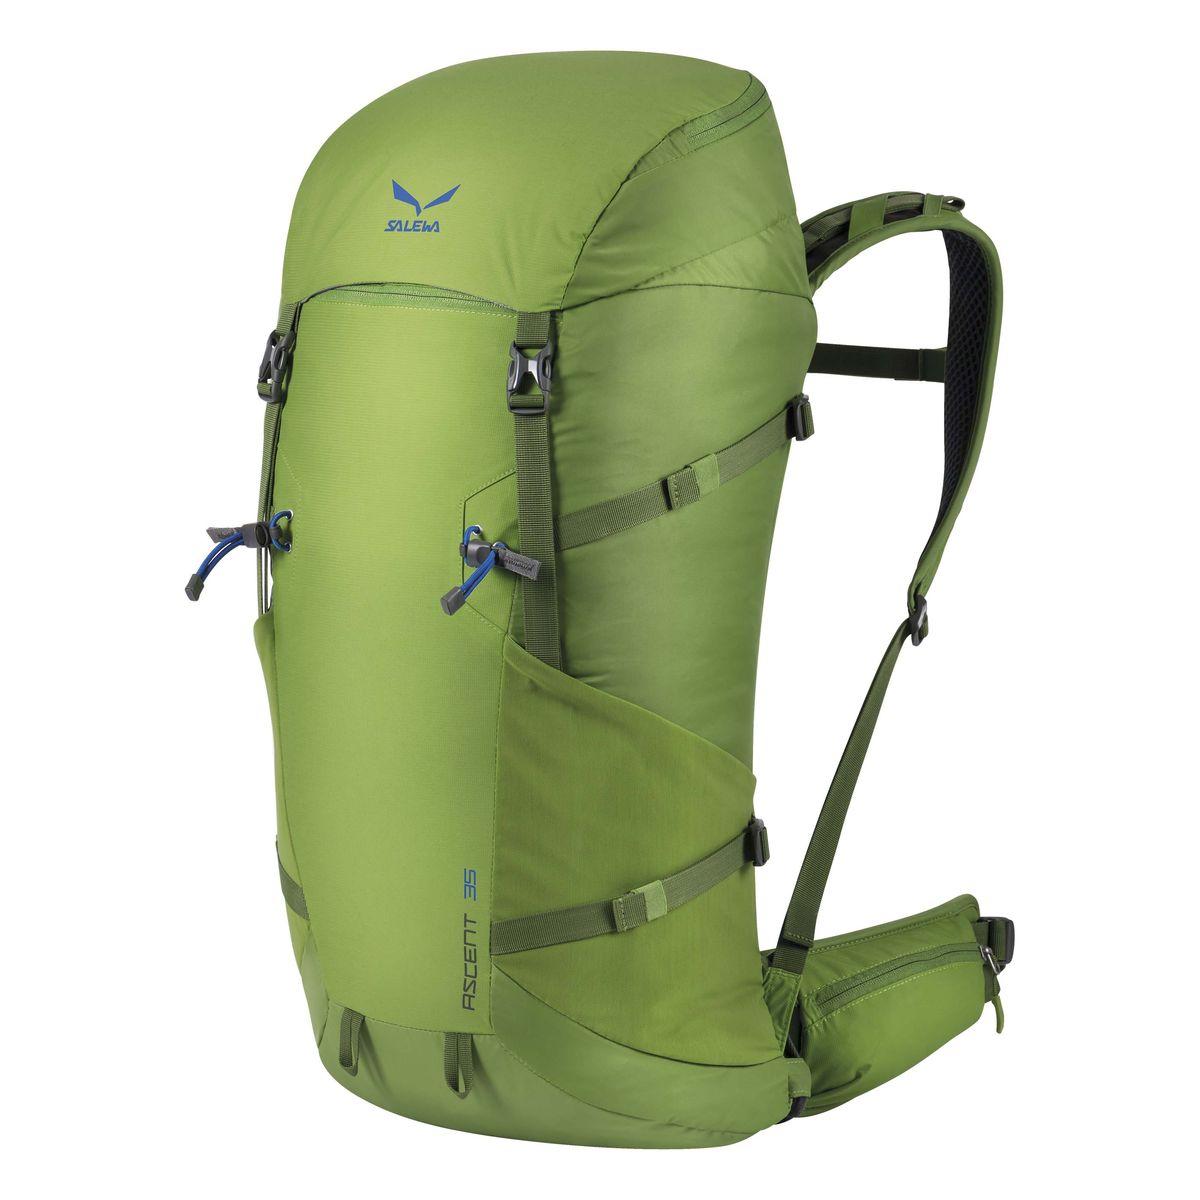 Рюкзак туристический Salewa Ascent 35, цвет: светло-зеленый, 35л